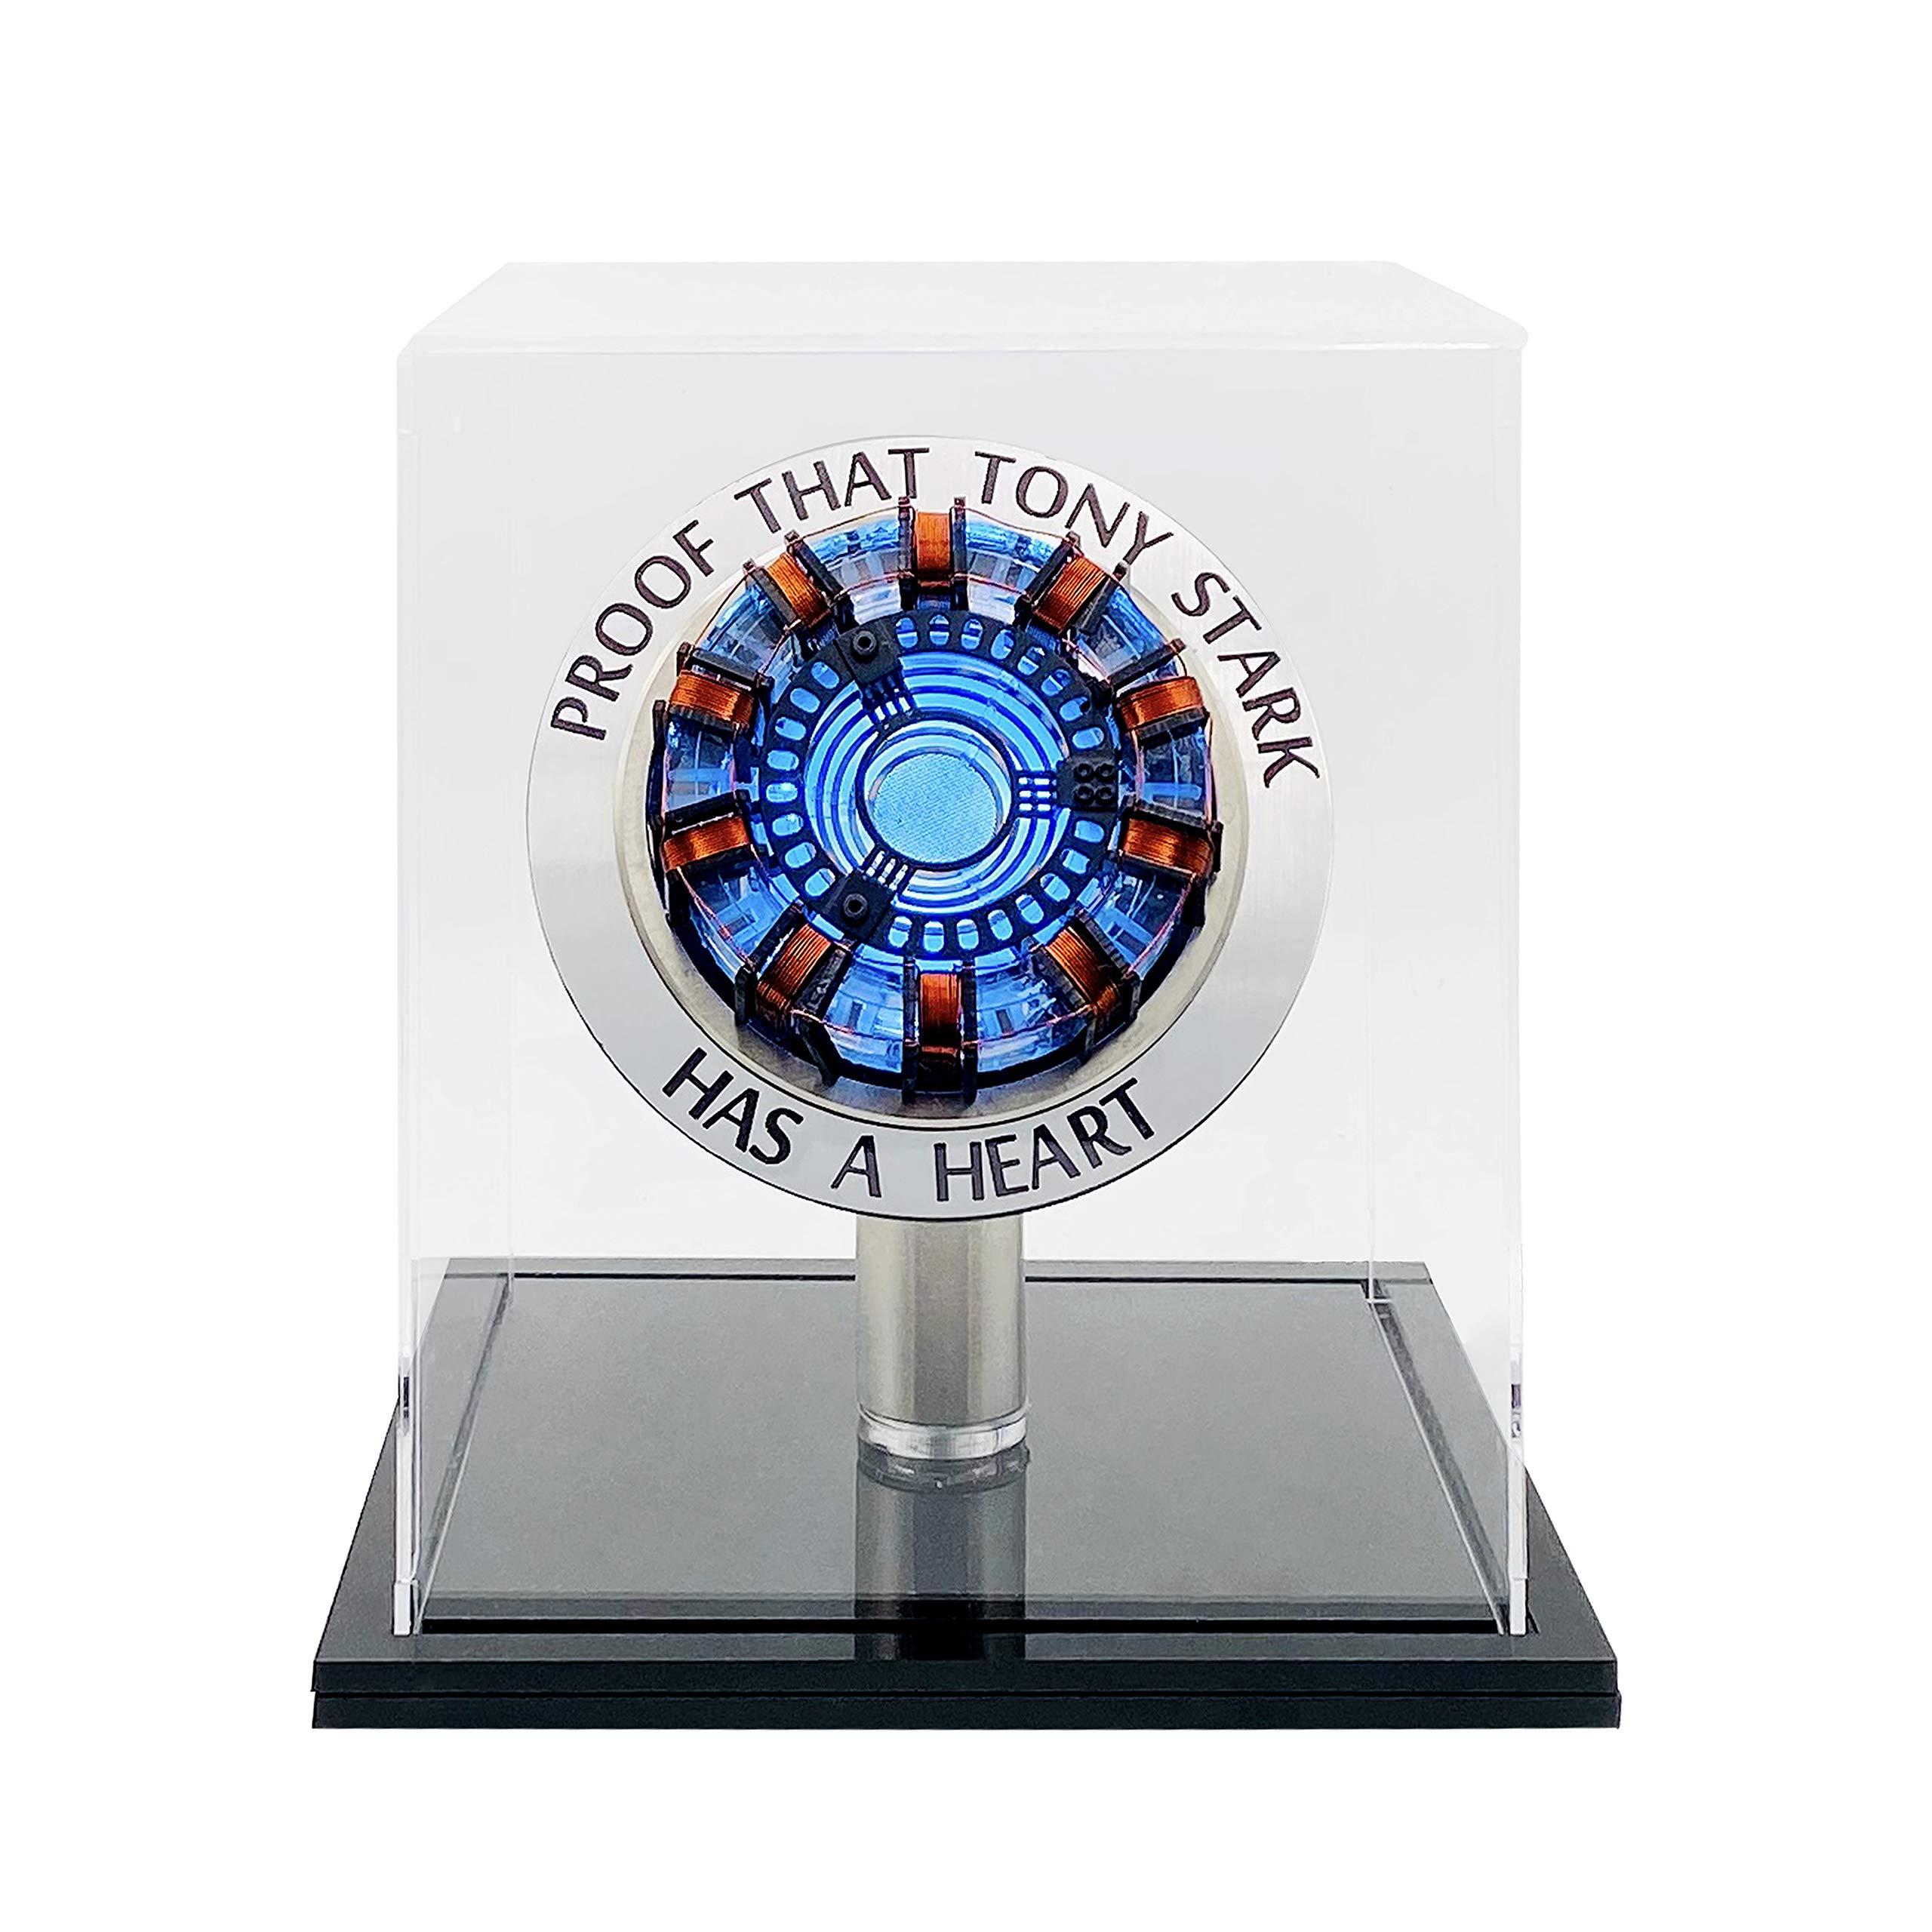 Lonyiabbi 1:1 Iron Man Arc Reactor MK1 DIY Finished Product Model Tony Stark Led Light USB with Display Box